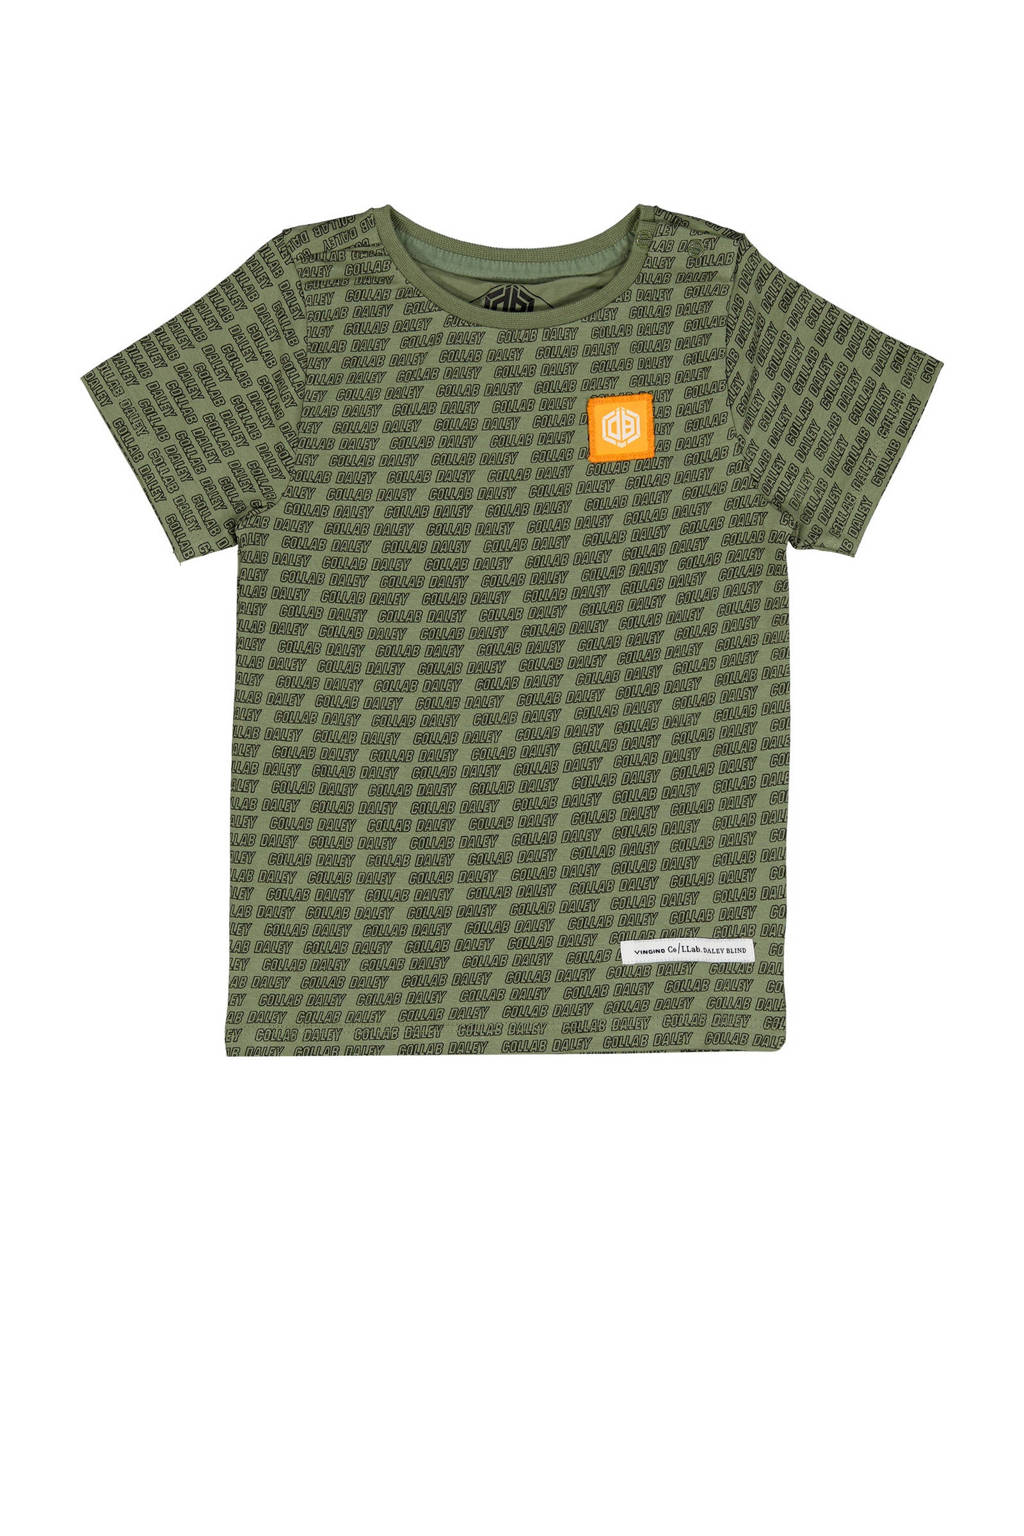 Vingino Daley Blind T-shirt Hafiro met all over print 201 light army green, 201 Light Army Green